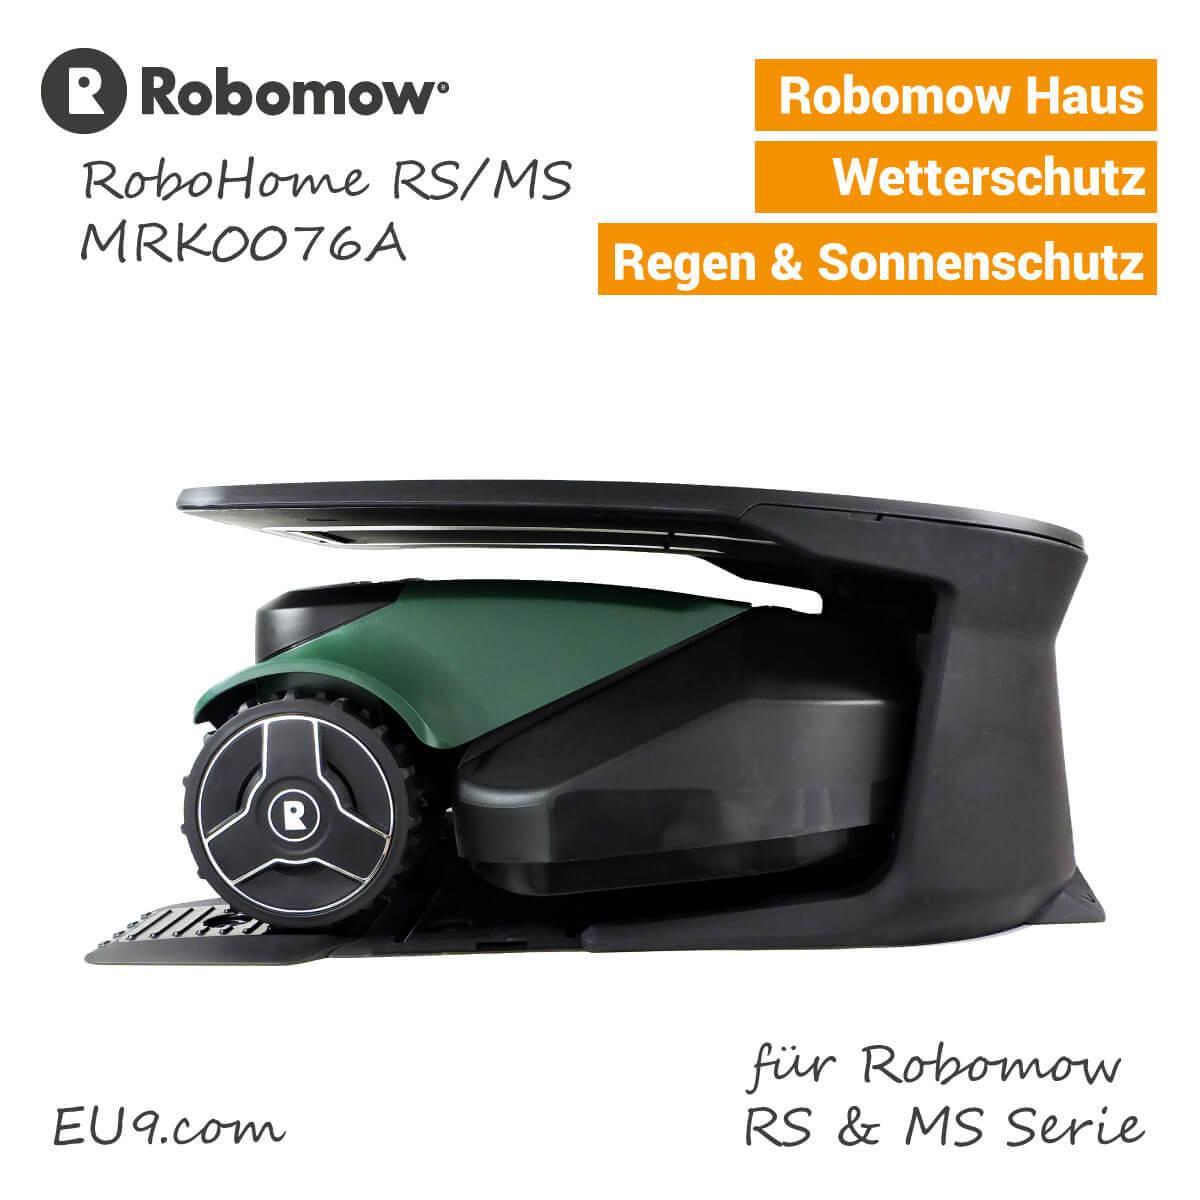 robomow robohome rs ms m hroboter garage g nstig bei. Black Bedroom Furniture Sets. Home Design Ideas